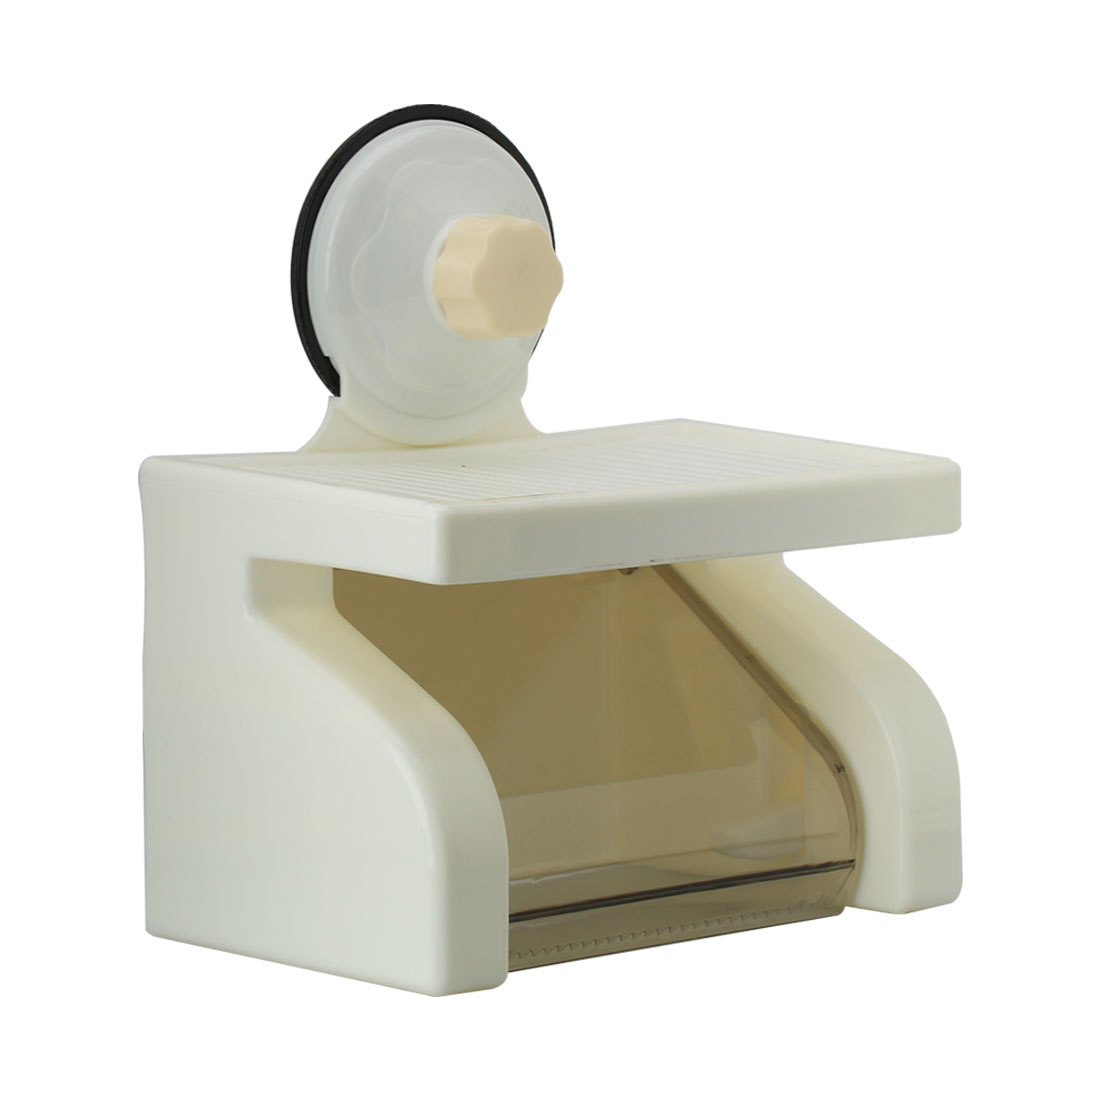 Household Washroom Plastic Suction Cup Toilet Paper Tissue Holder Bracket